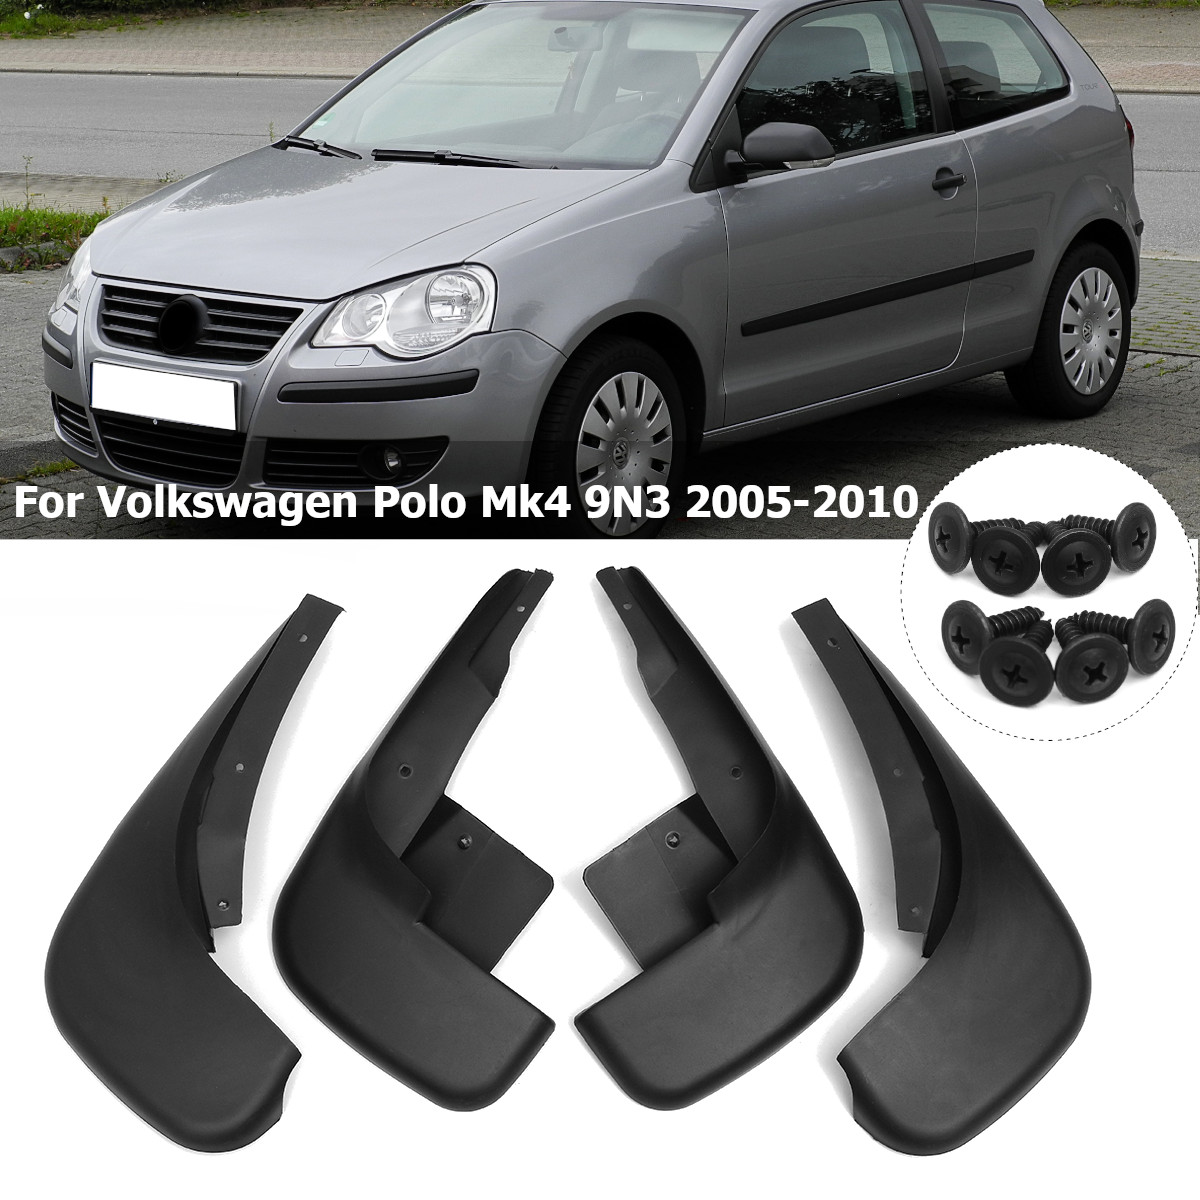 Guardabarros para VW Polo Mk4 9N3 2005-2009 guardabarros de coche guardabarros delantero trasero accesorios de guardabarros